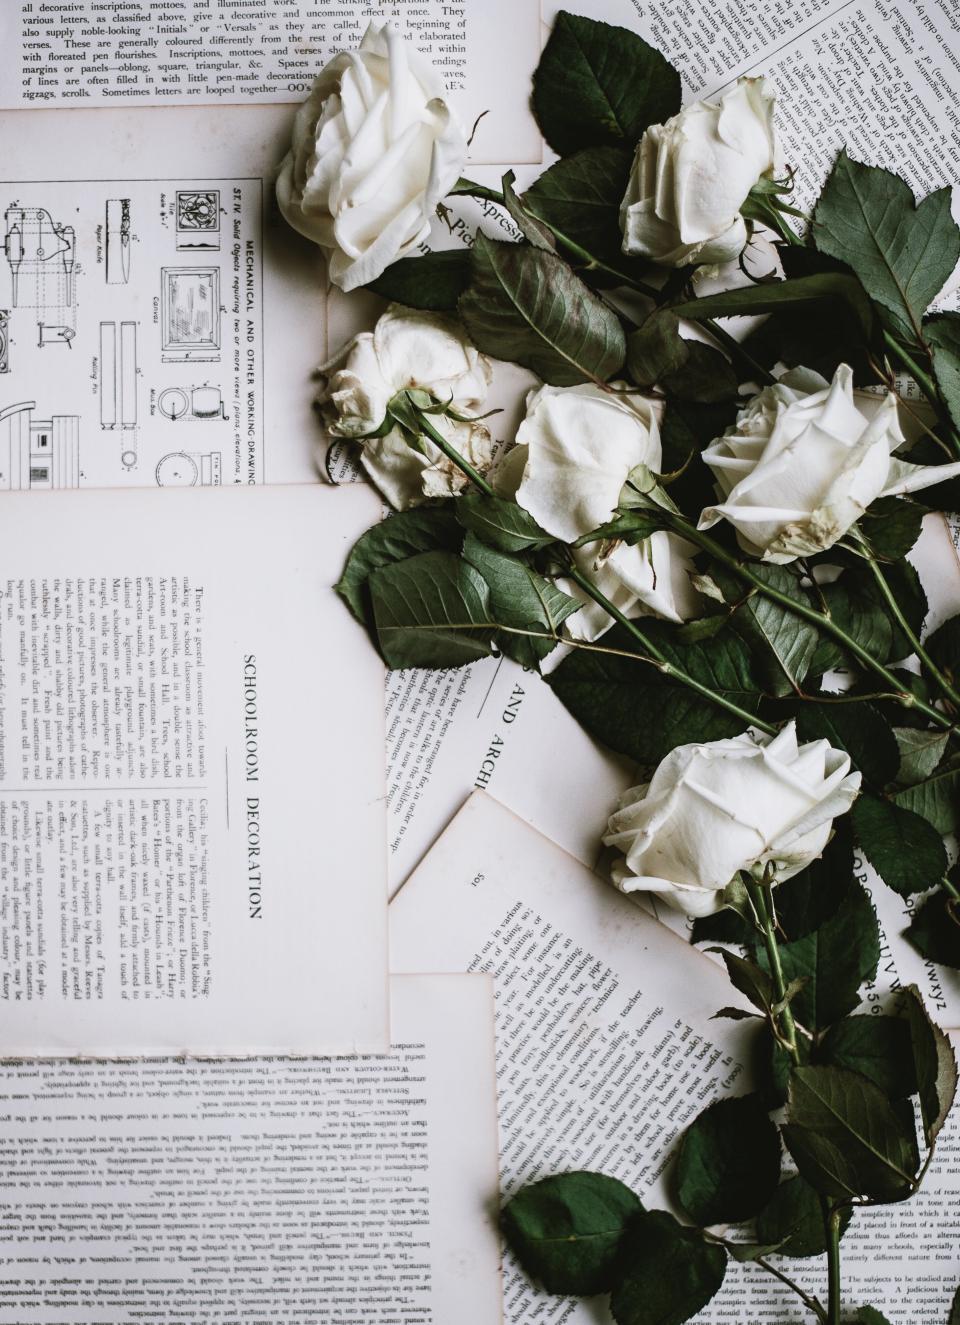 rose white flower letter leaf decoration book paper words drawing